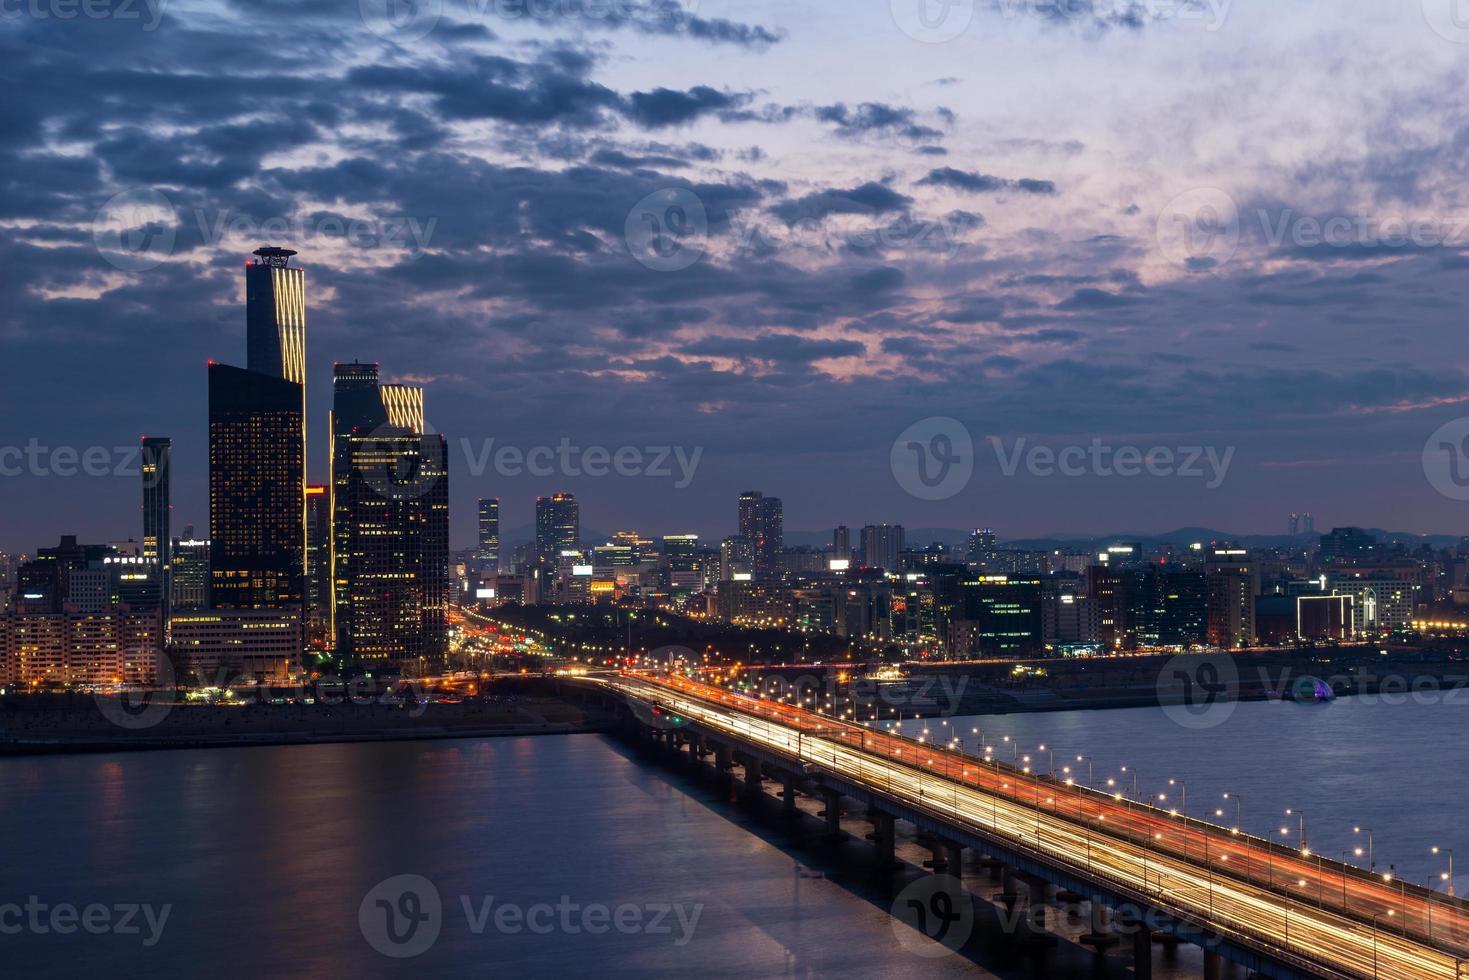 Seoul at Dusk photo